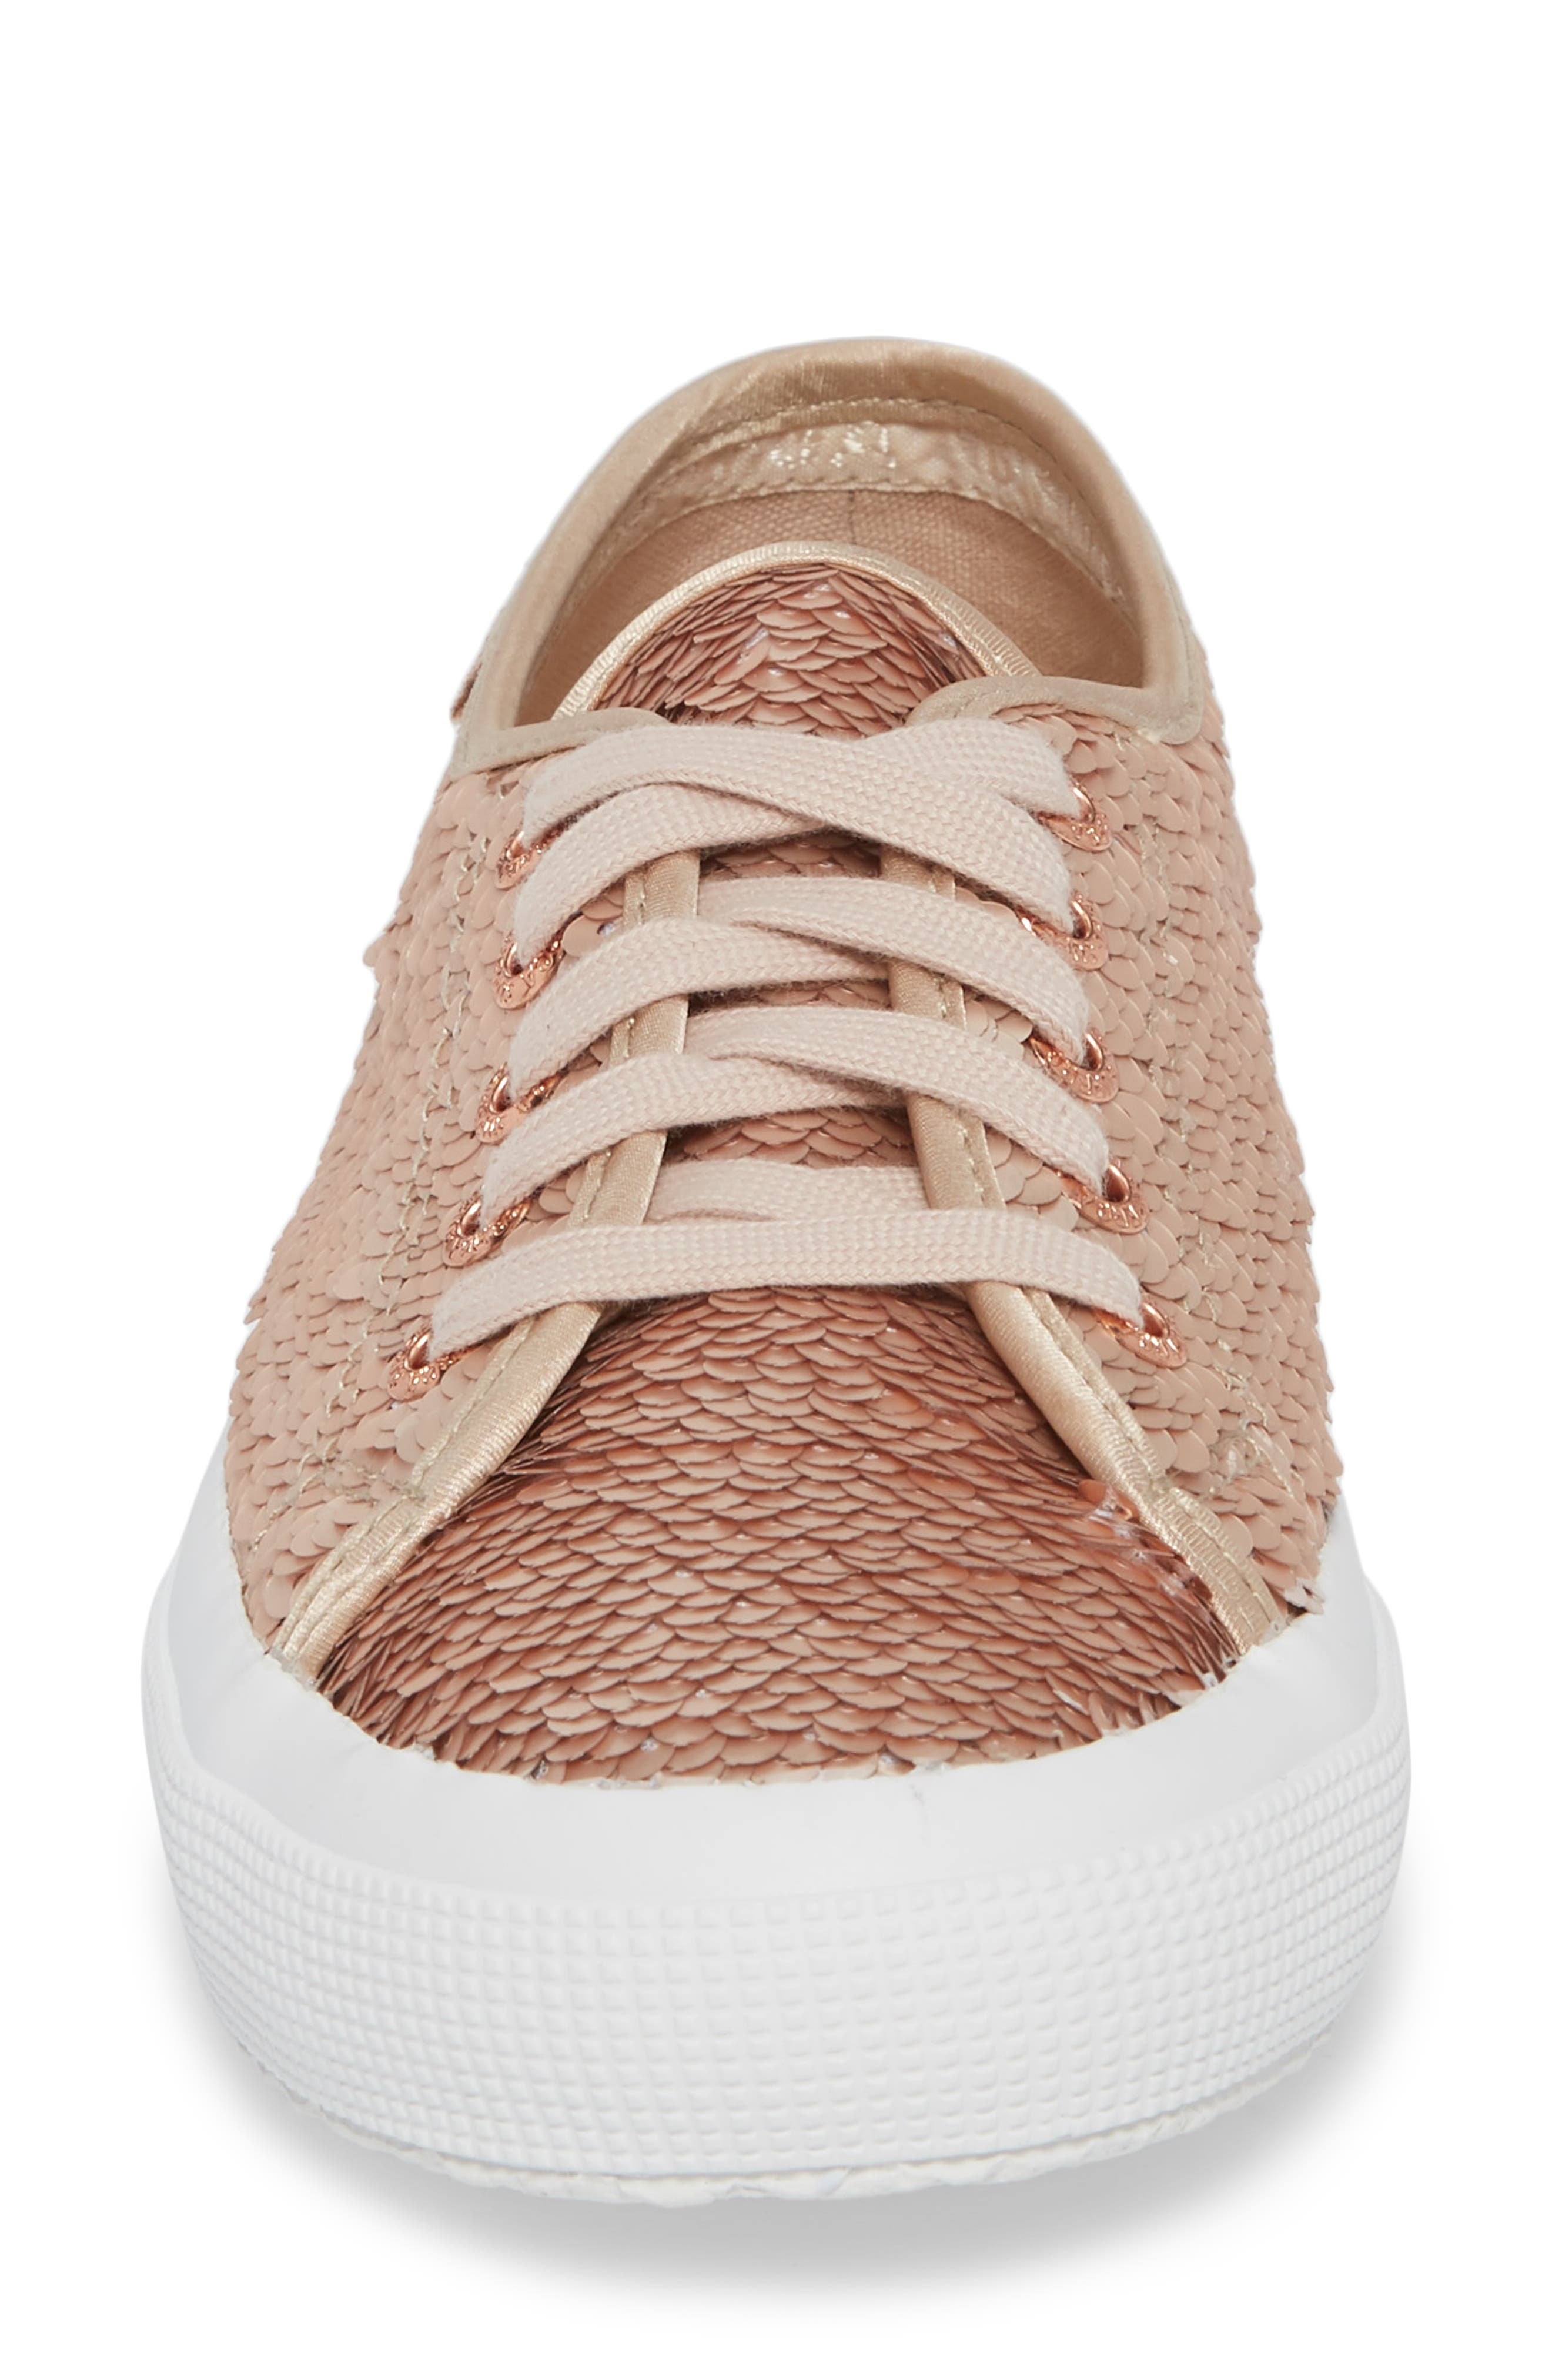 2750 Pairidescent Low Top Sneaker,                             Alternate thumbnail 4, color,                             687